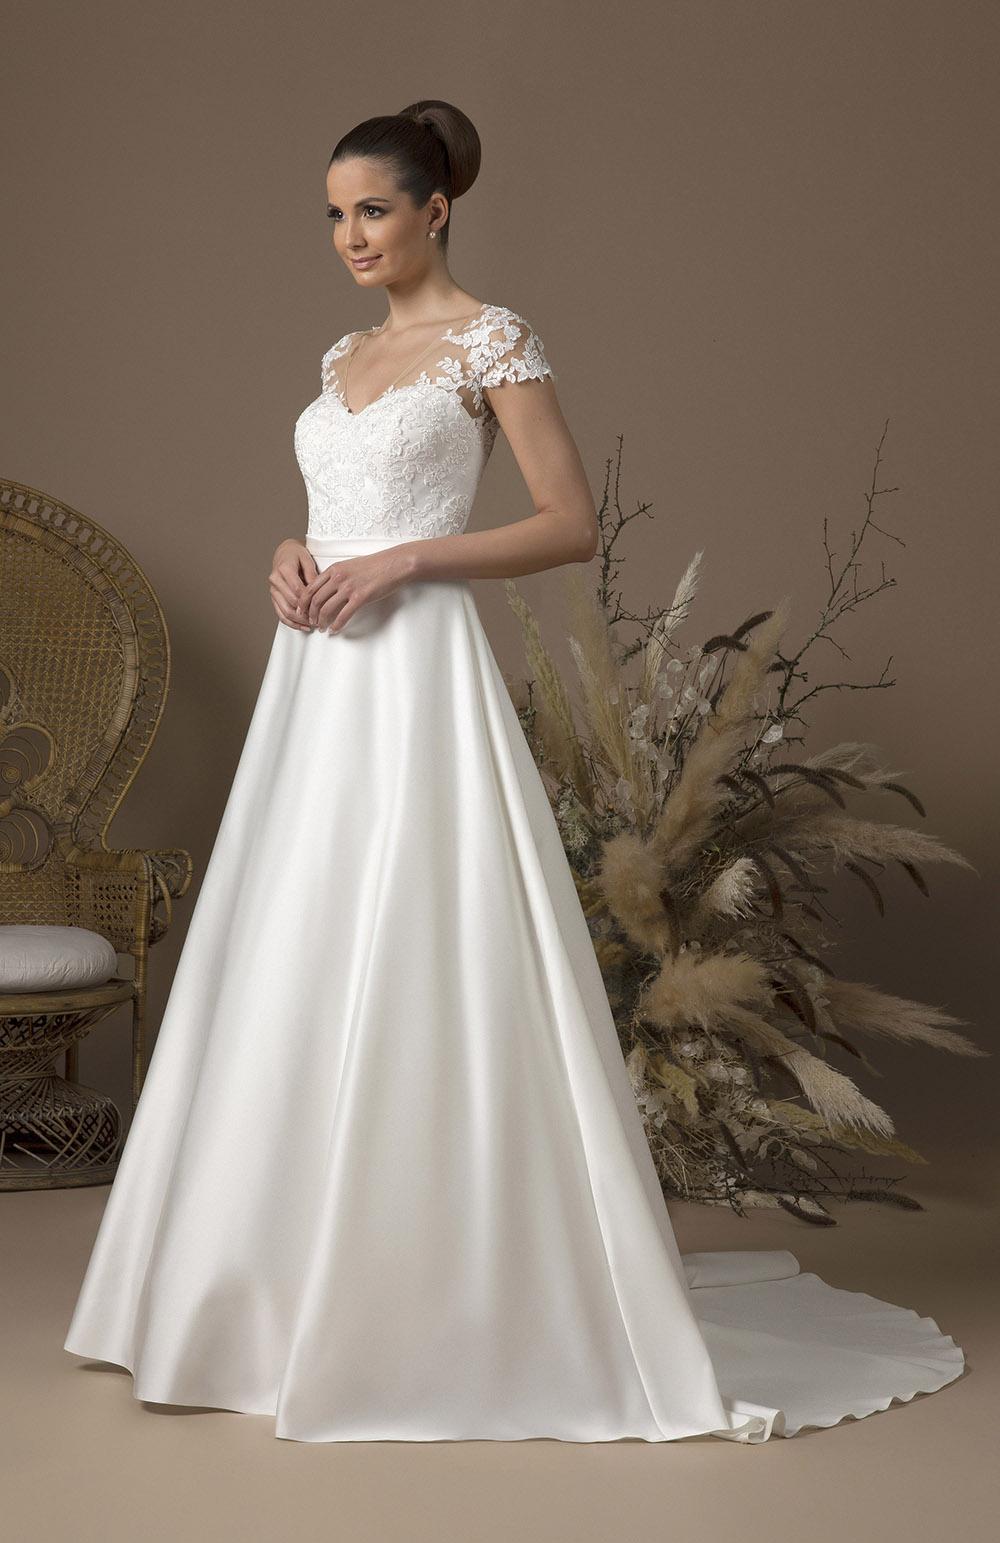 Robe de mariée Modèle Debby